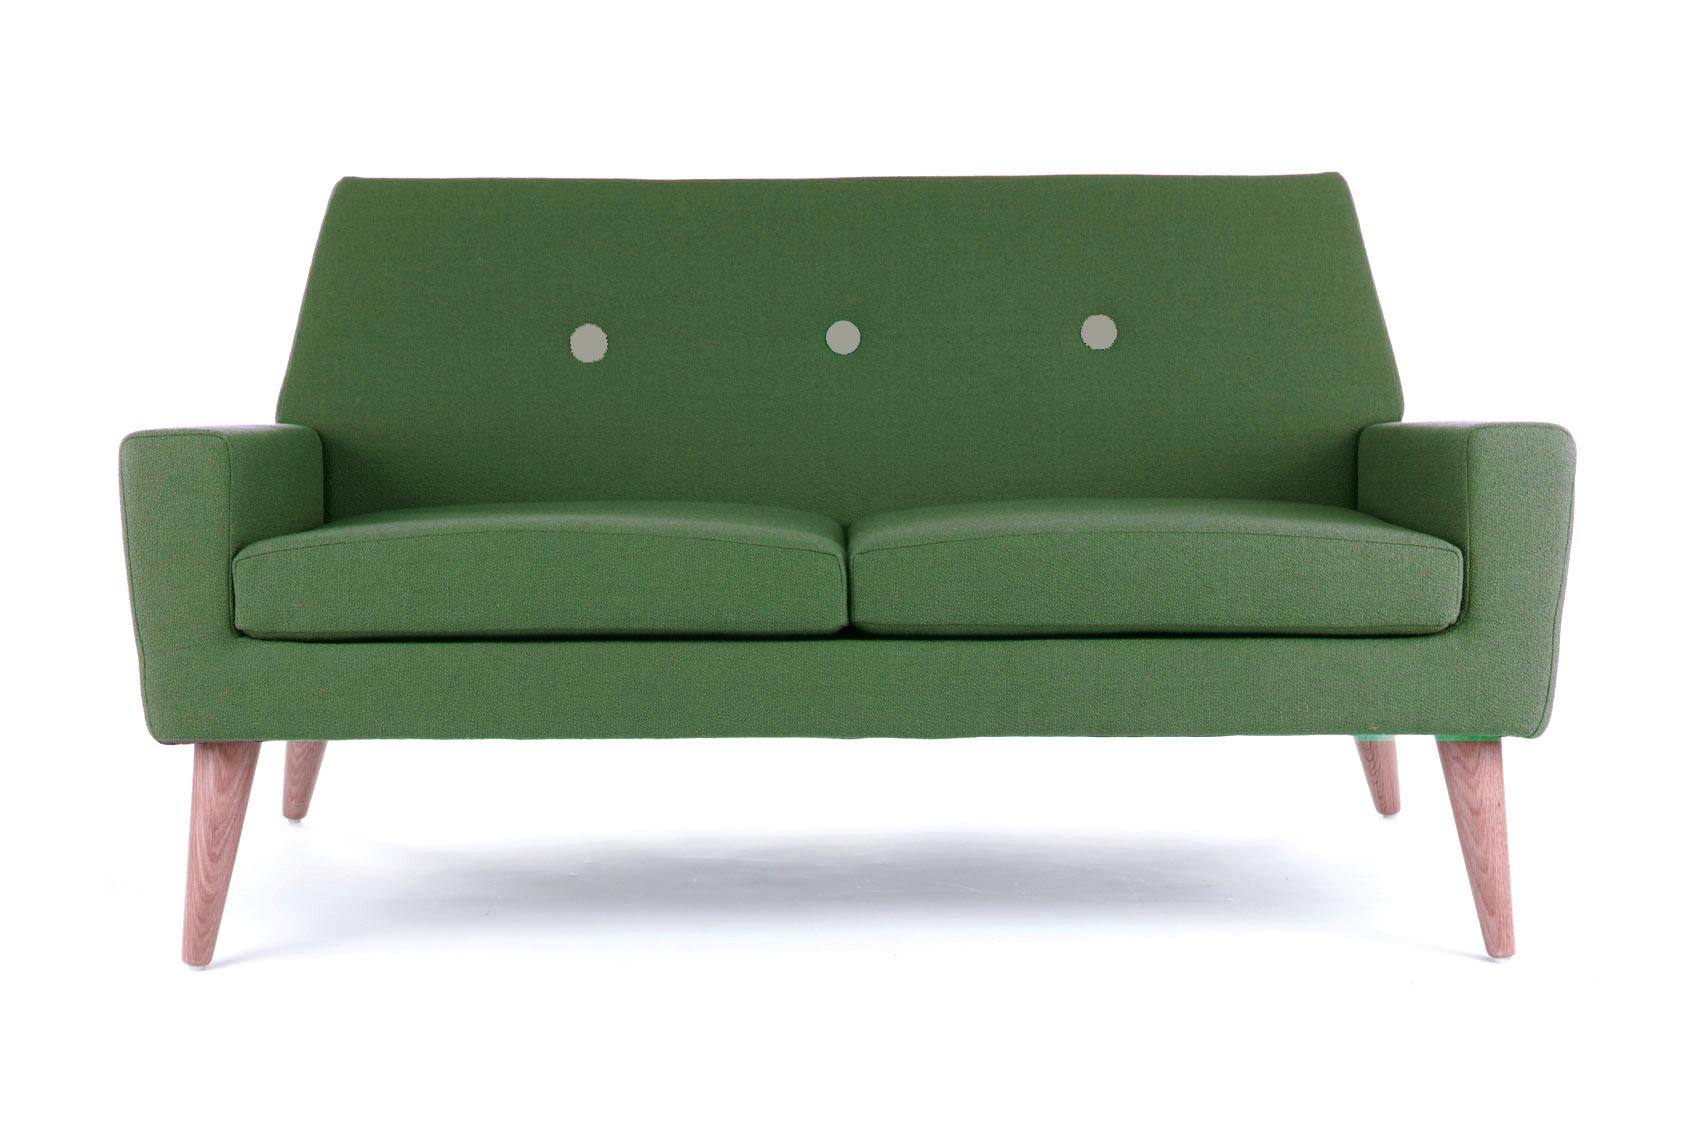 Finsbury Sofa sml green.jpg